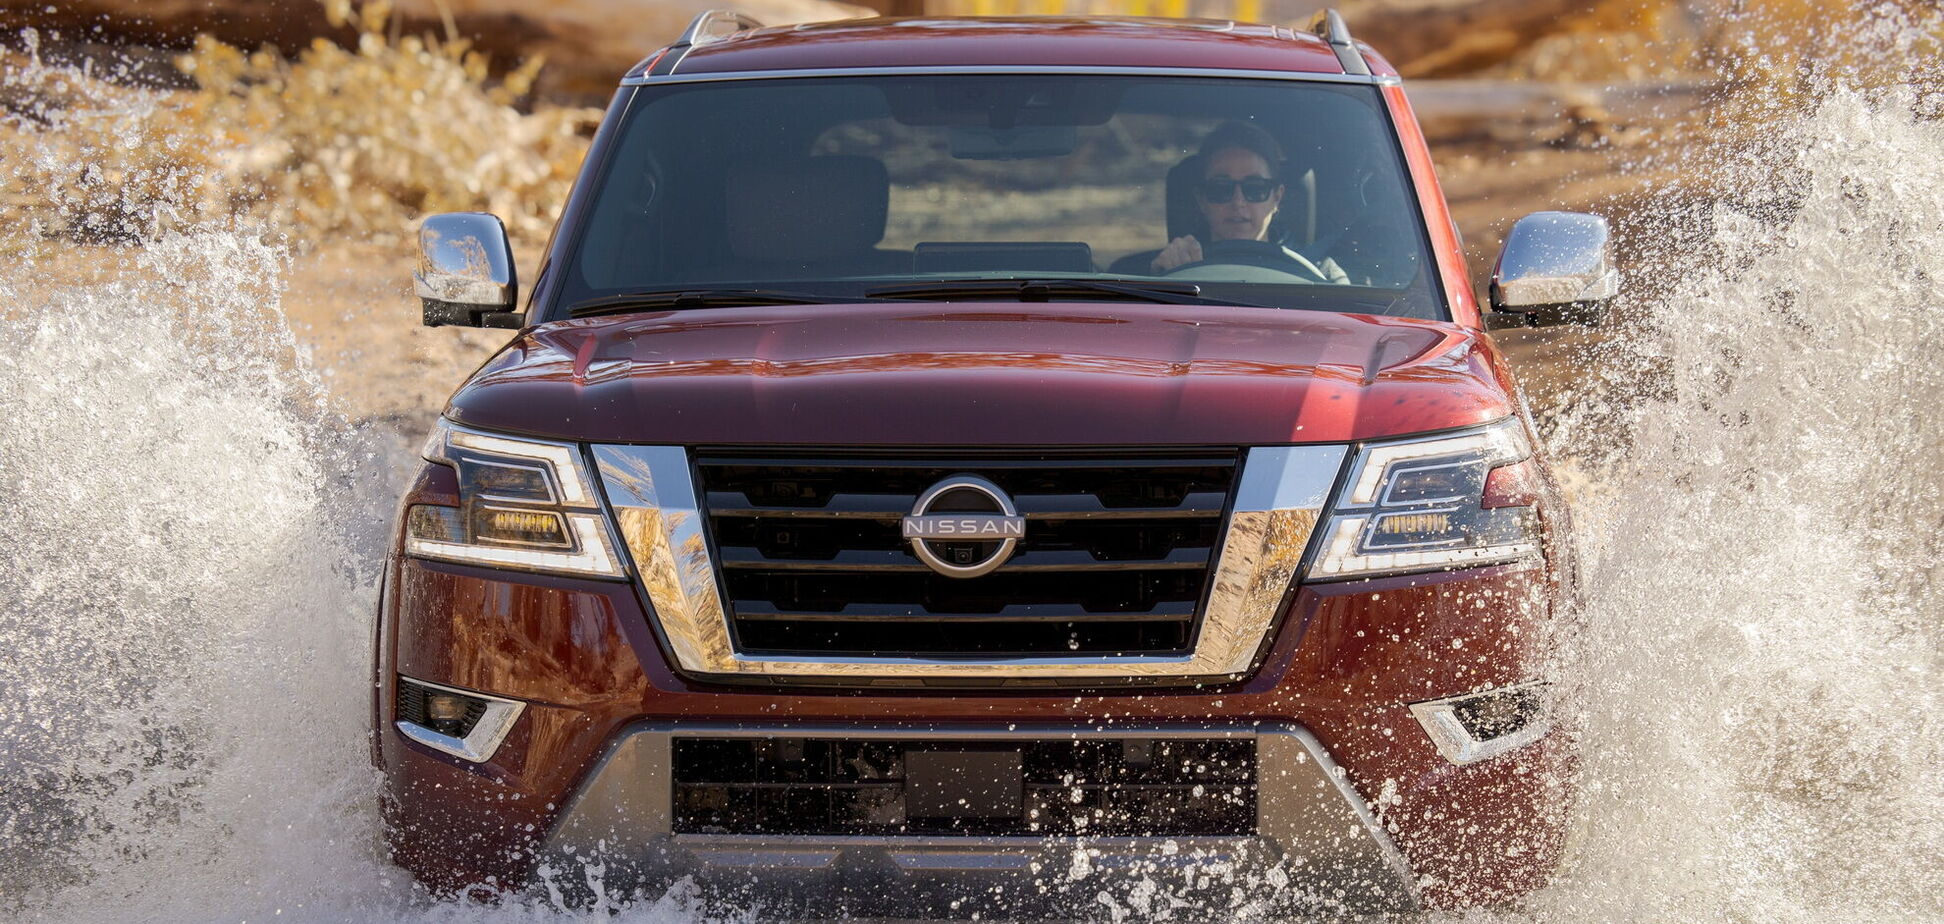 Nissan оновив флагманську модель Armada